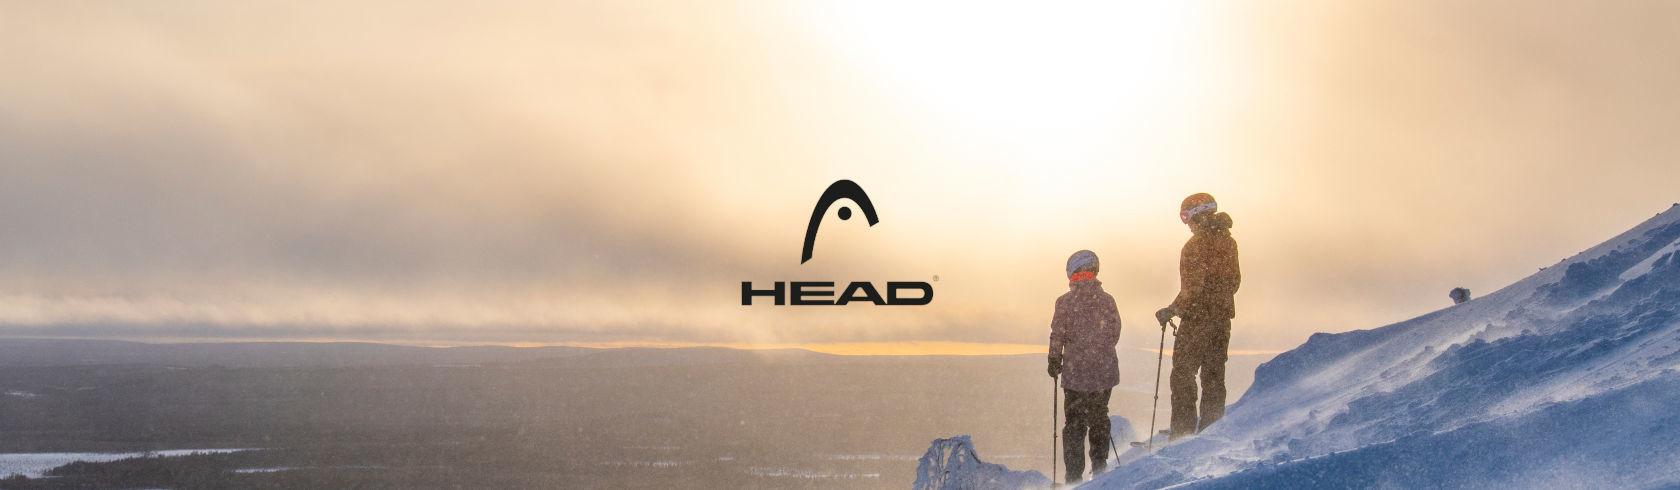 Head skis brand logo